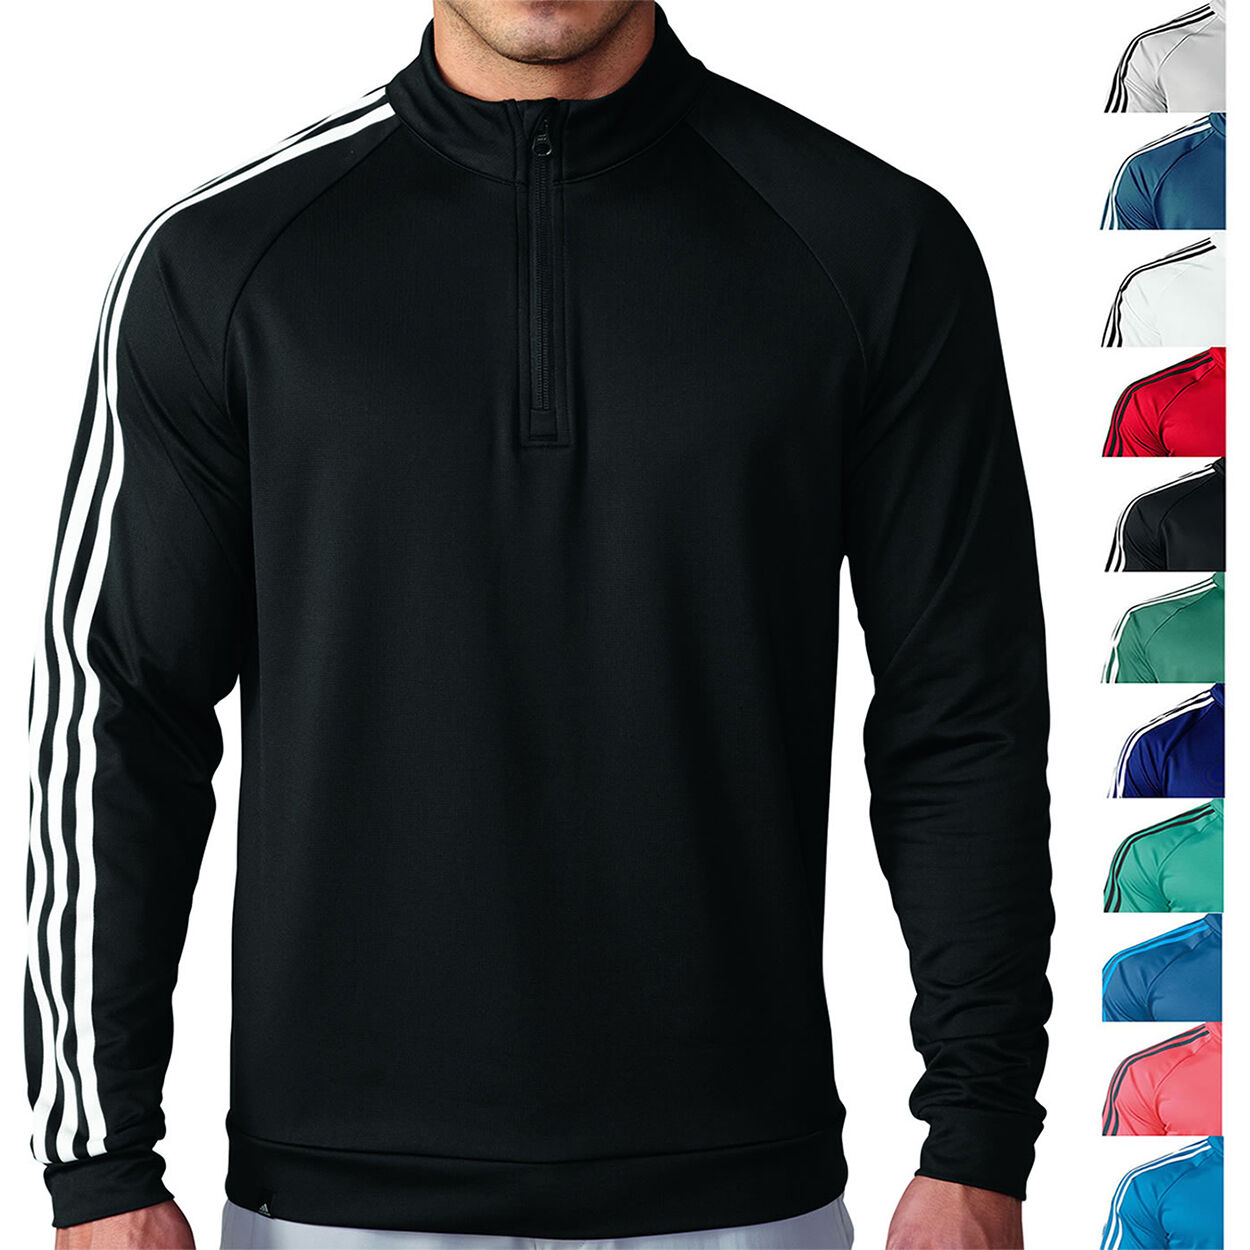 Adidas Golf 3 Stripes 1/4 Zip Pullover Mens New